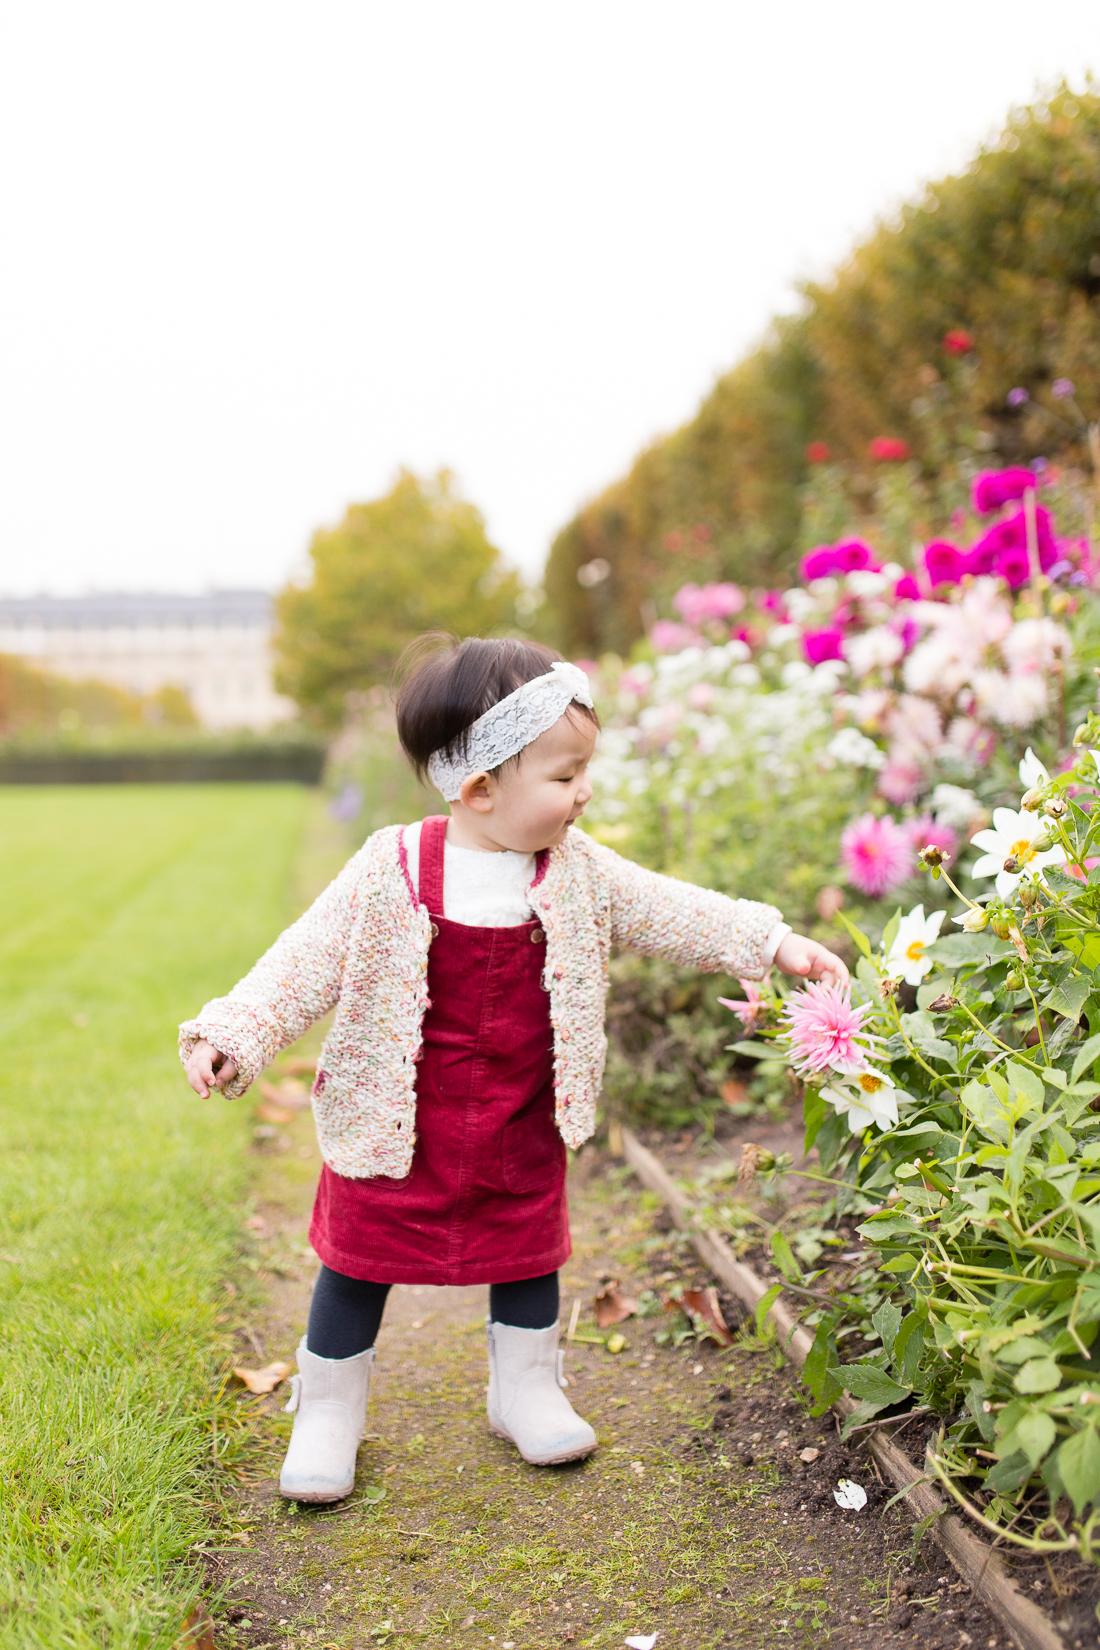 spring-fall-family-maternity-paris-palais-royal-louvre-photo-session-inspiration-6